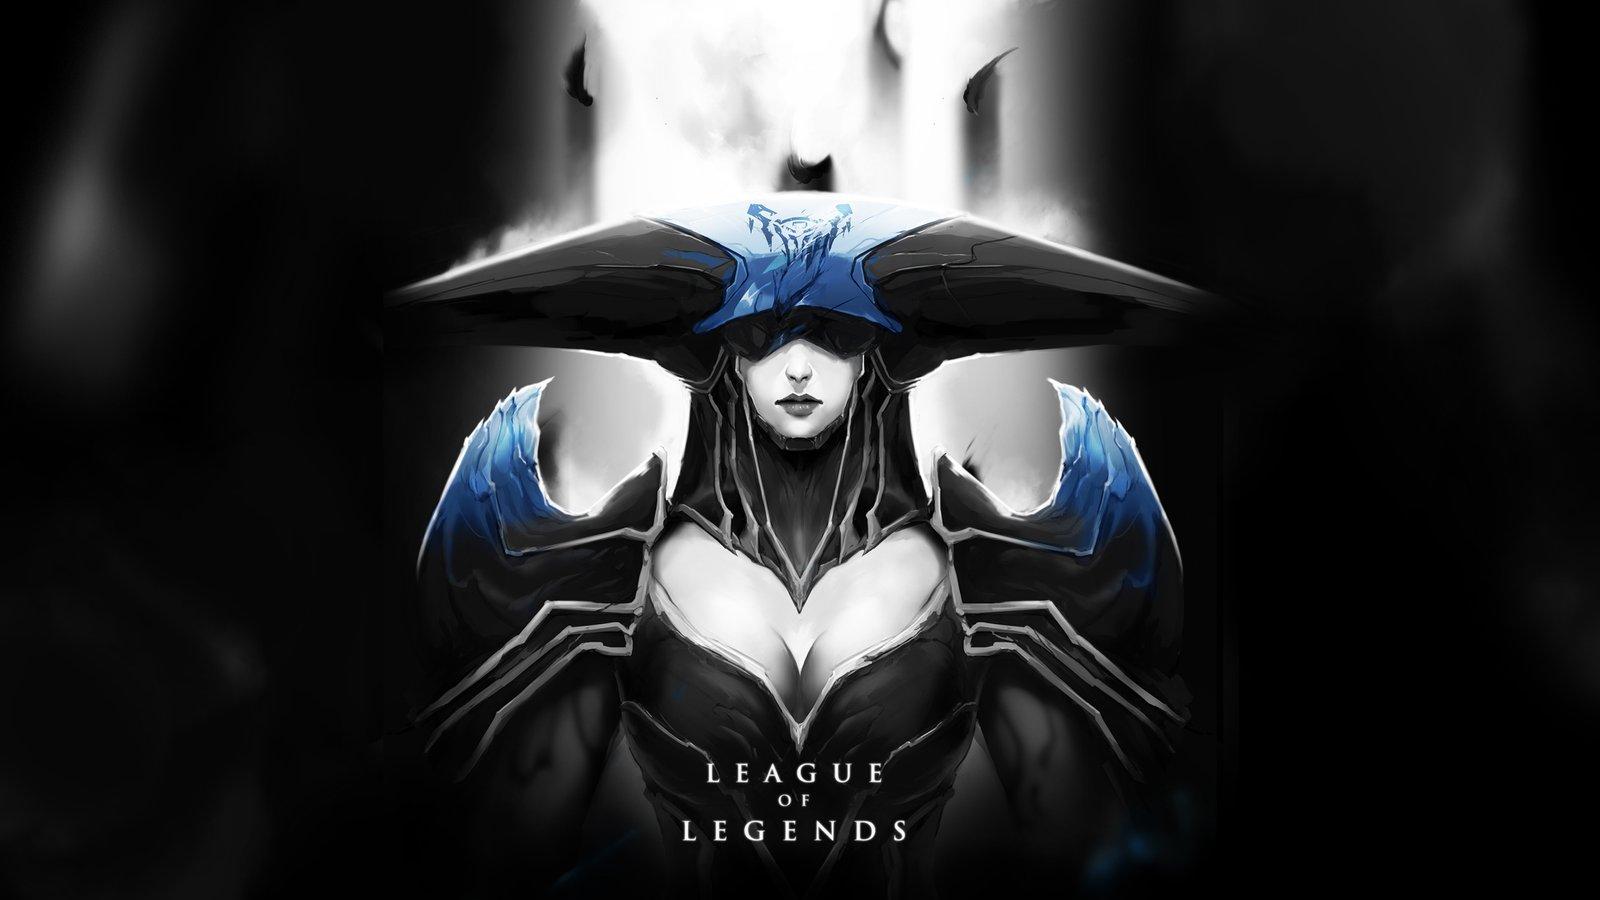 Lissandra League Of Legends Wallpapers HD 1920x1080